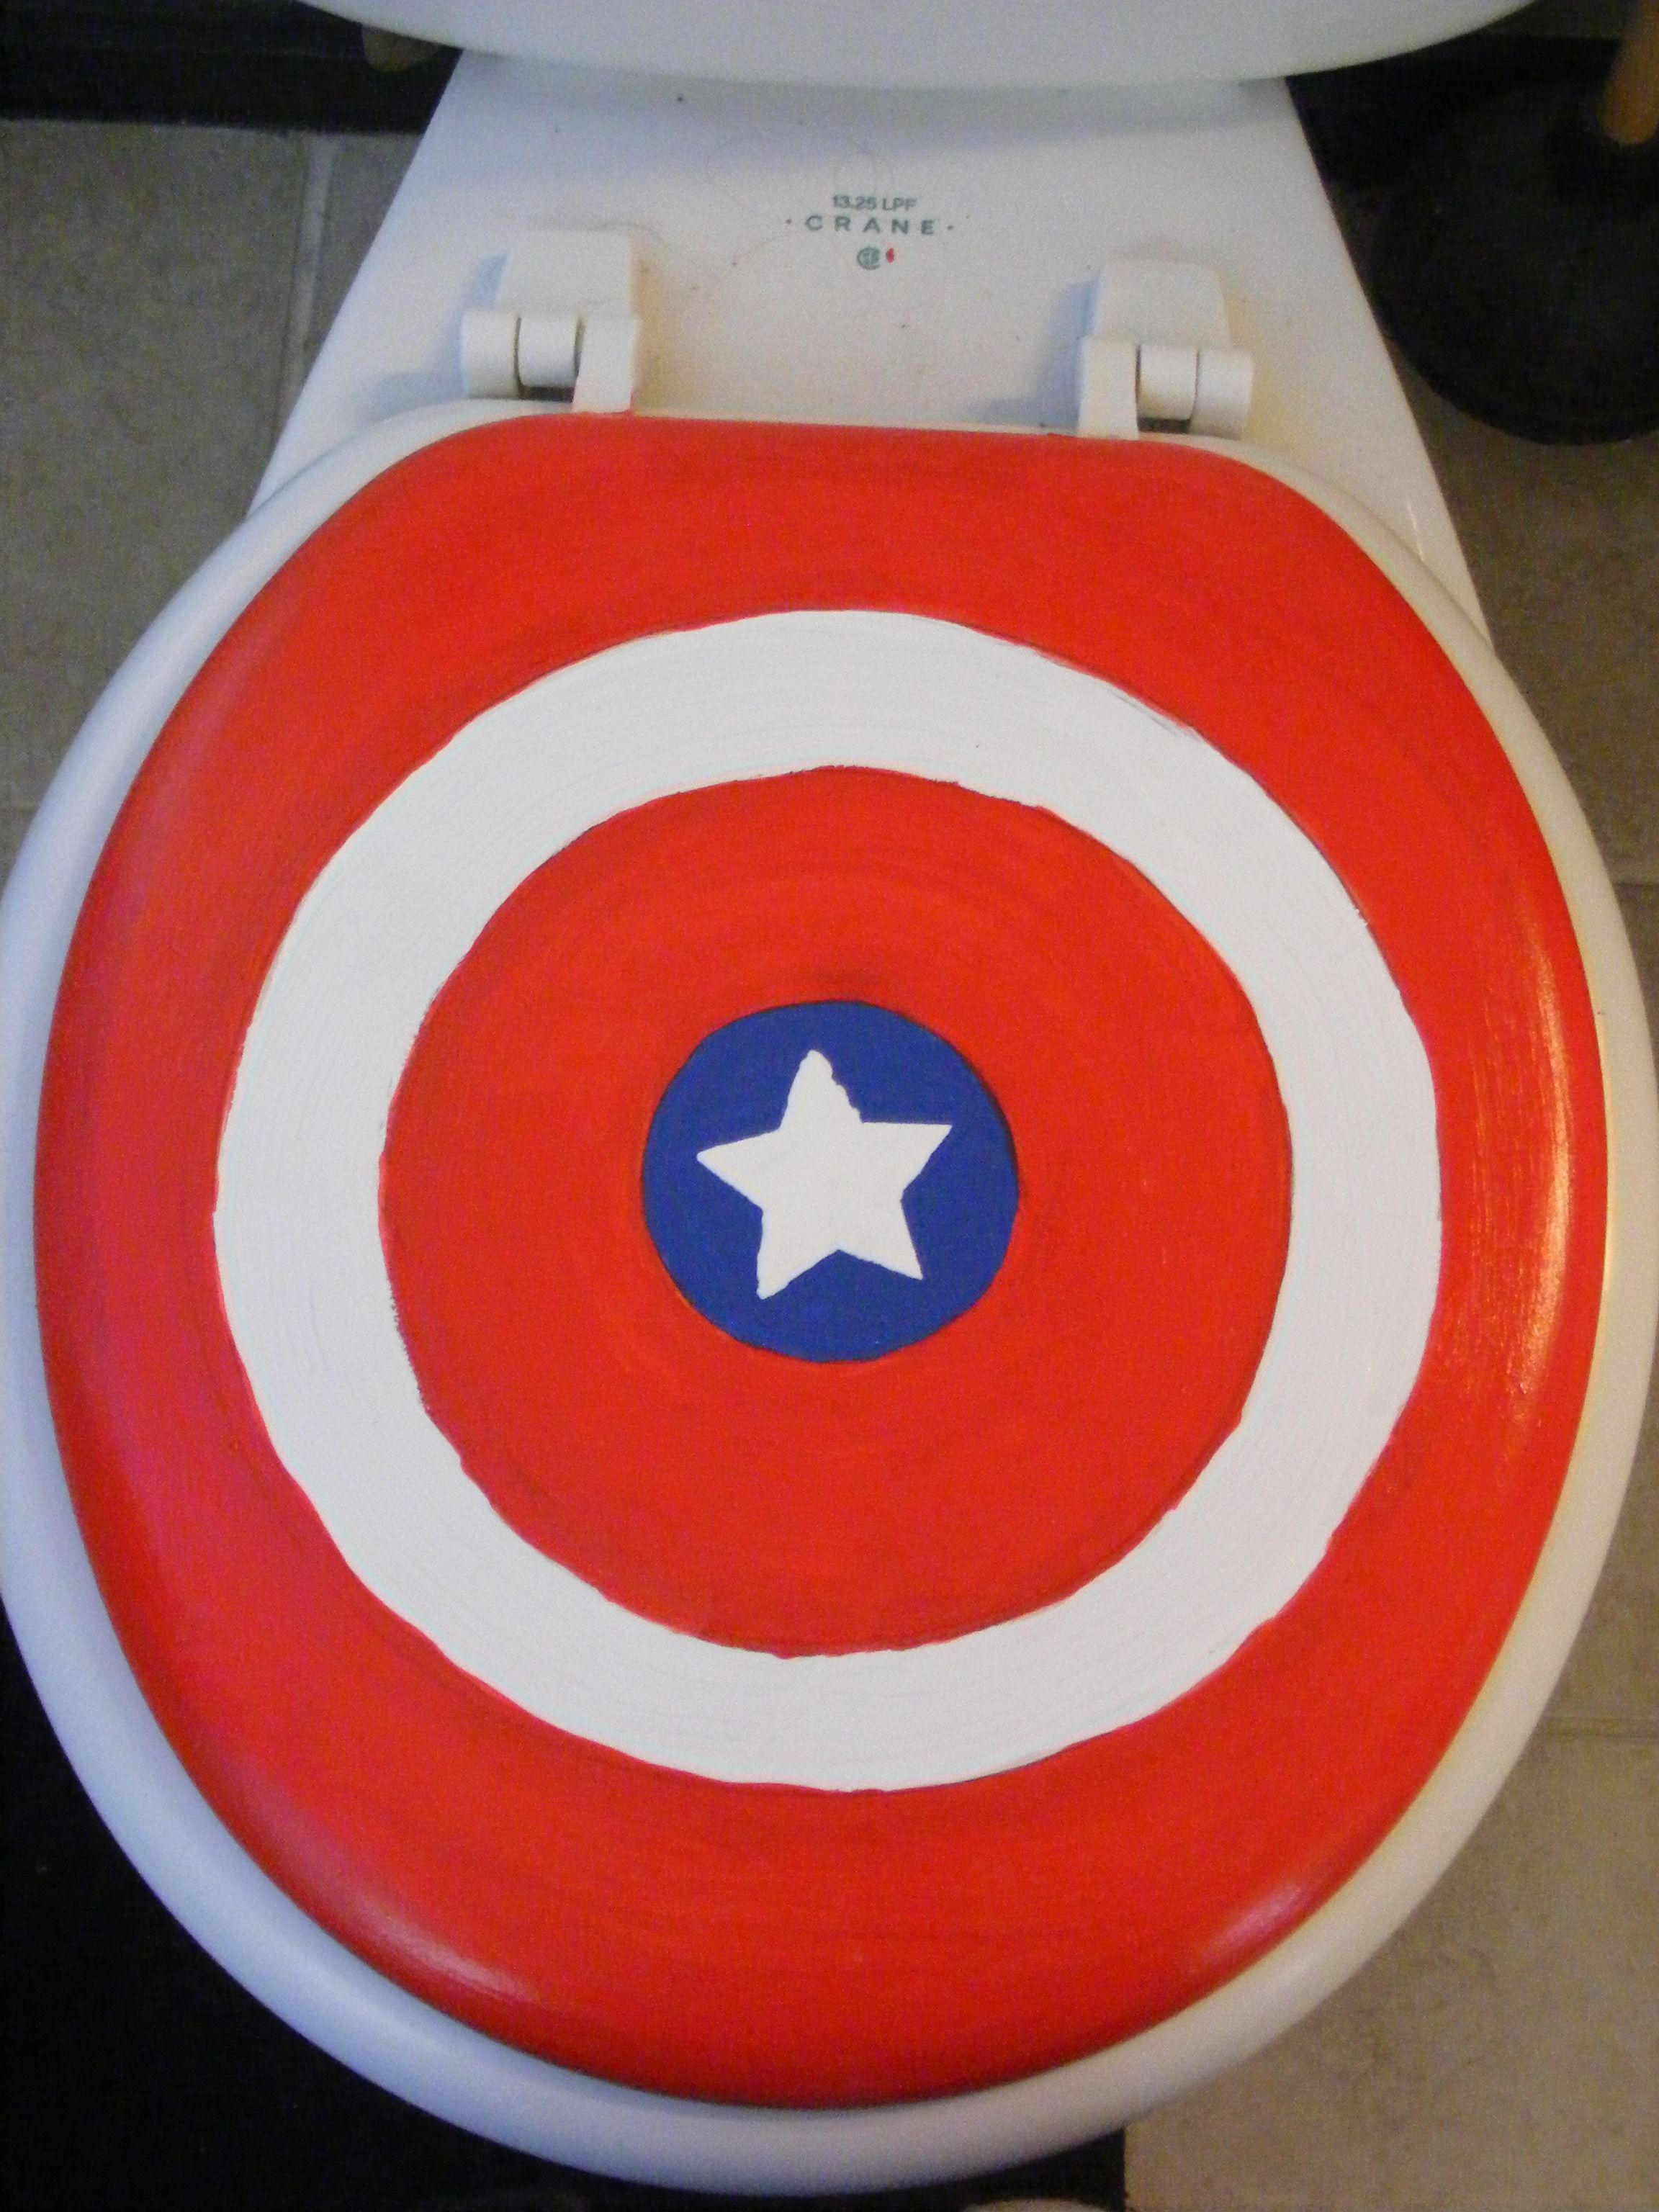 Toilet Seat For Superhero Bathroom Projects To Try Pinterest - Avengers bathroom decor for small bathroom ideas